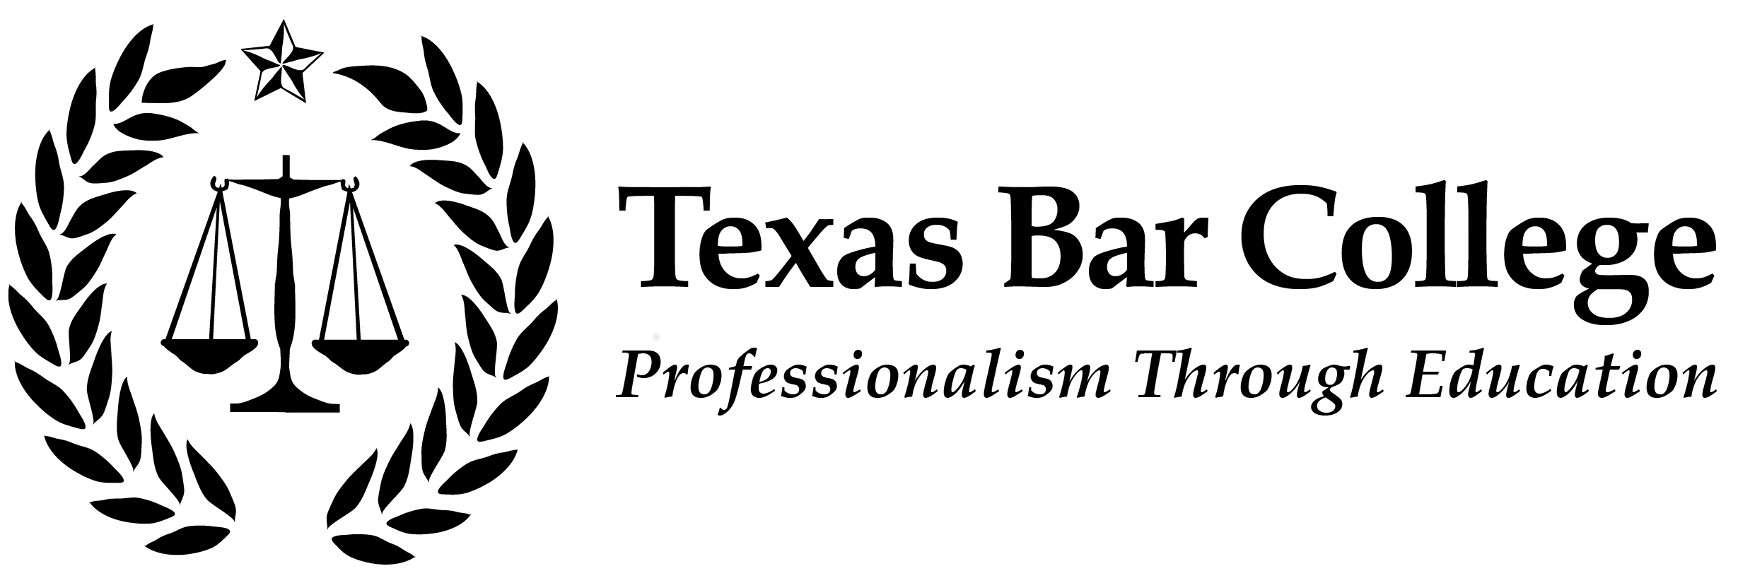 Laura Yaeger Texas Bar College